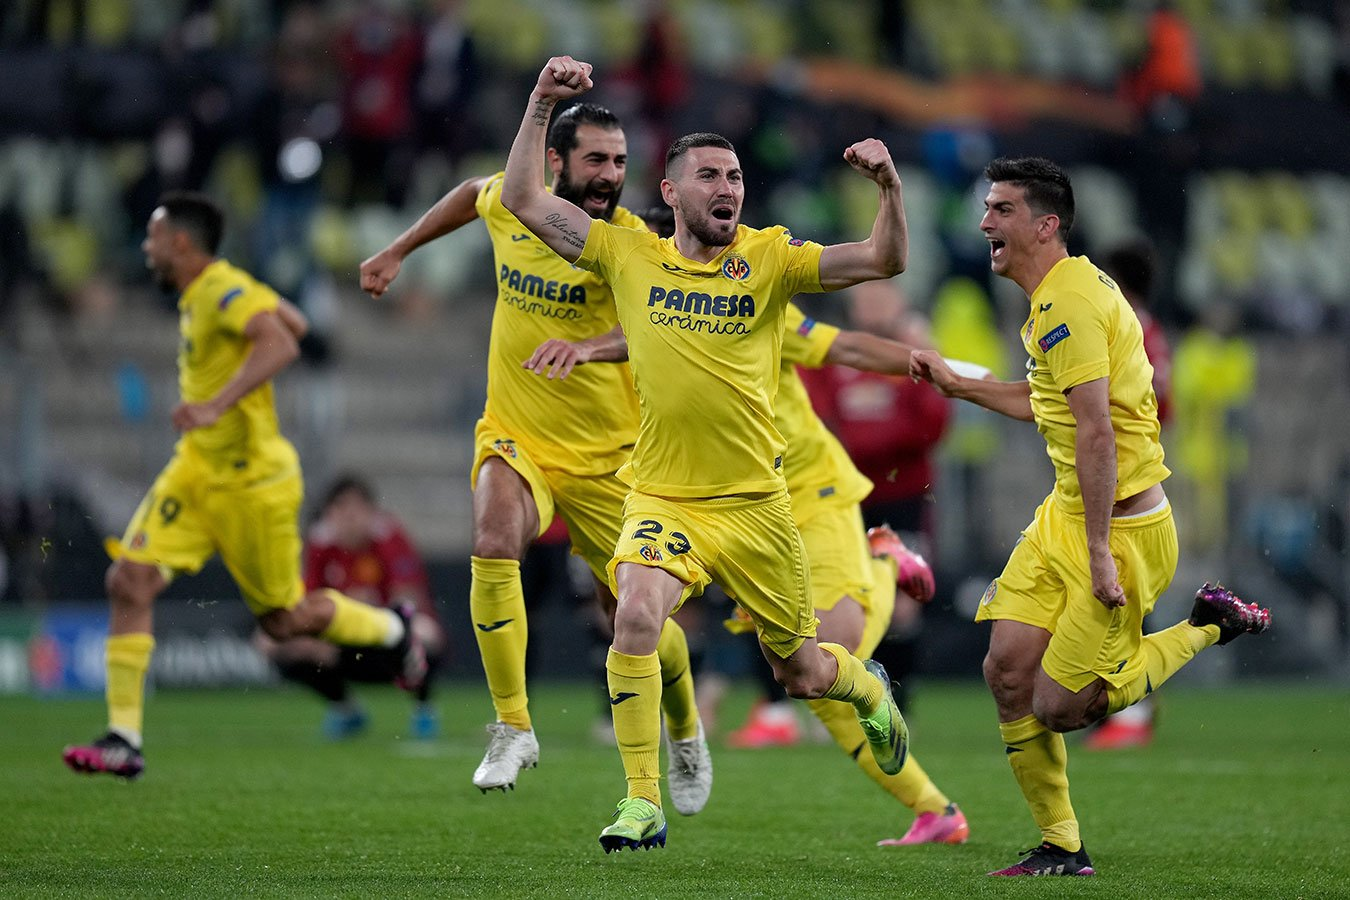 «Челси» — «Вильярреал». Прогноз «Фонбет»: неужели испанцы шокируют ещё один топ-клуб АПЛ?